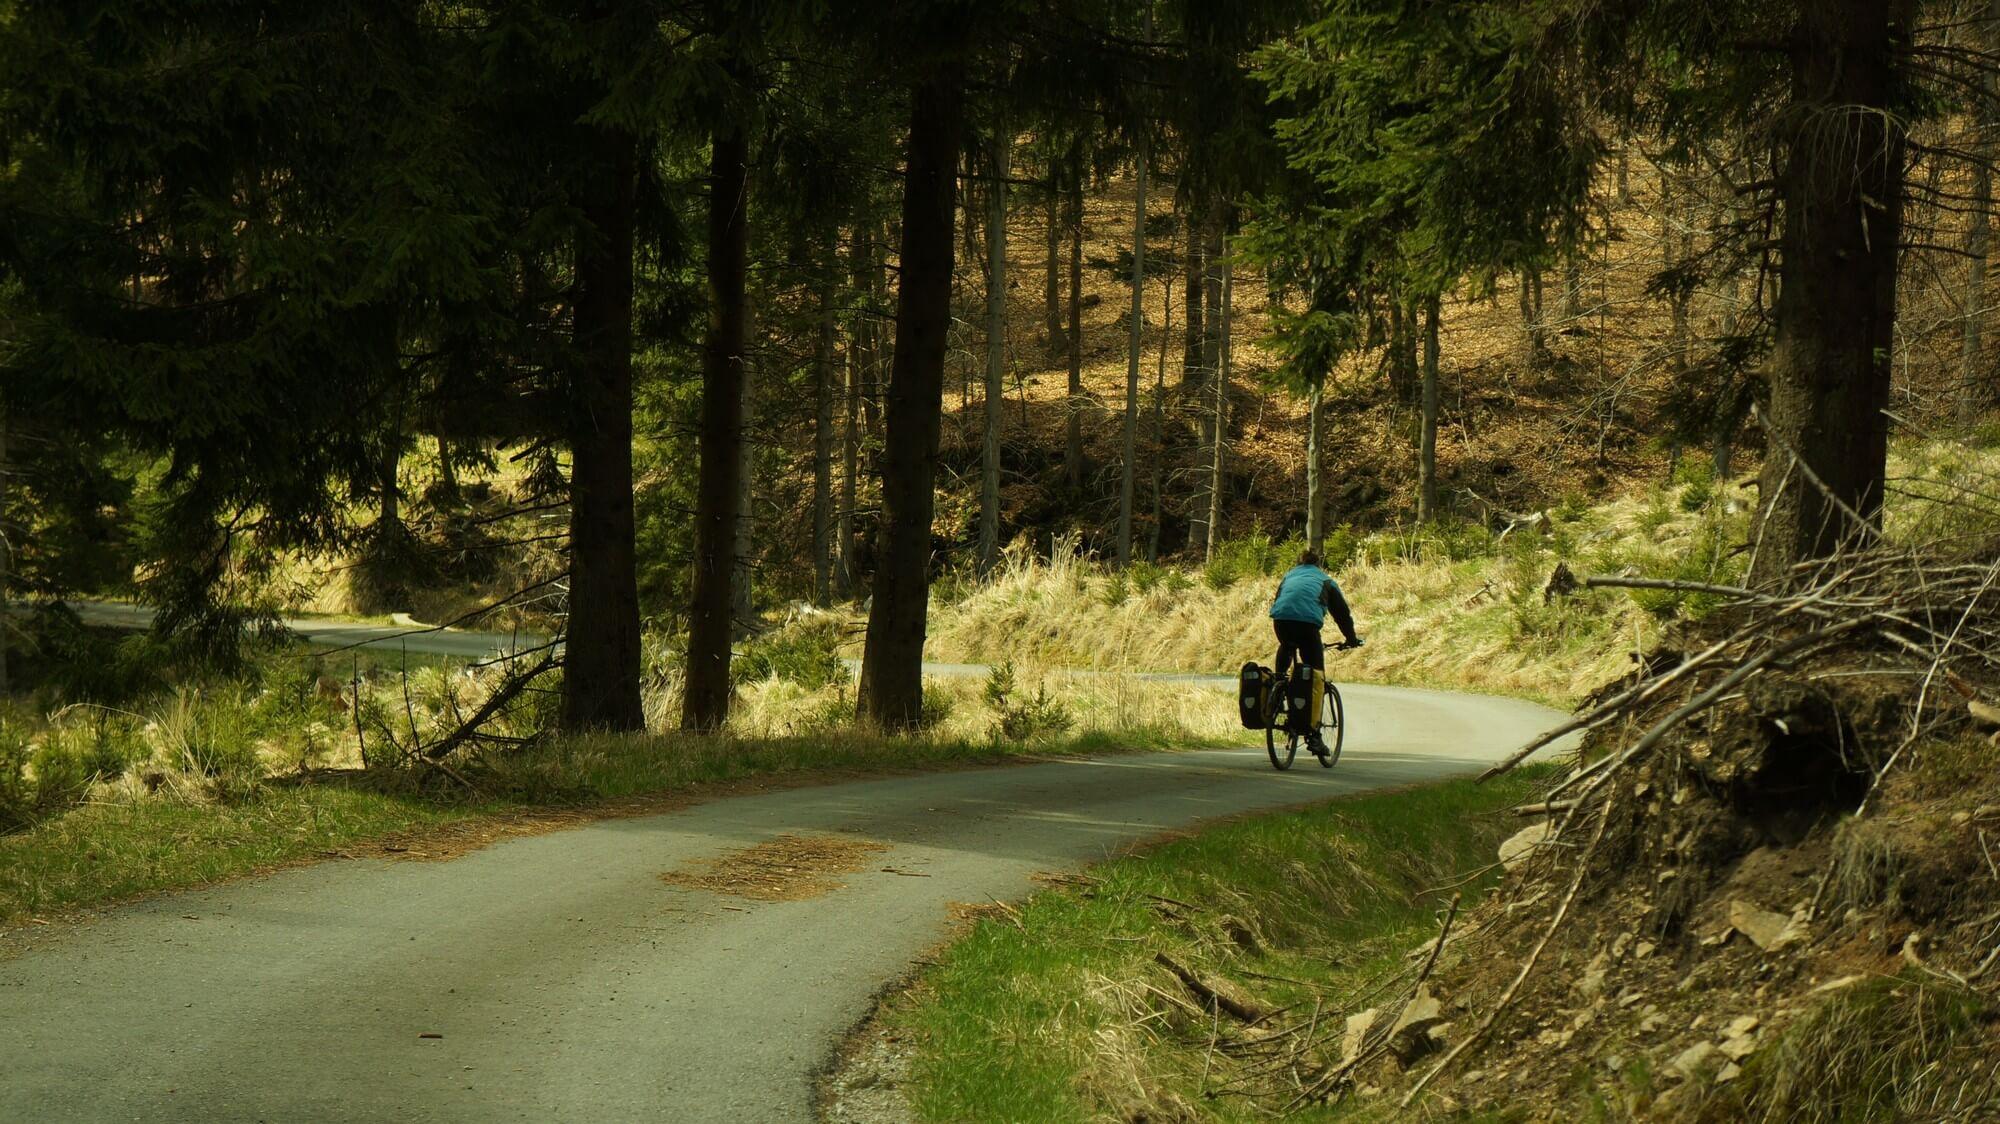 gory-sowie-rowerem-na-weekend-08